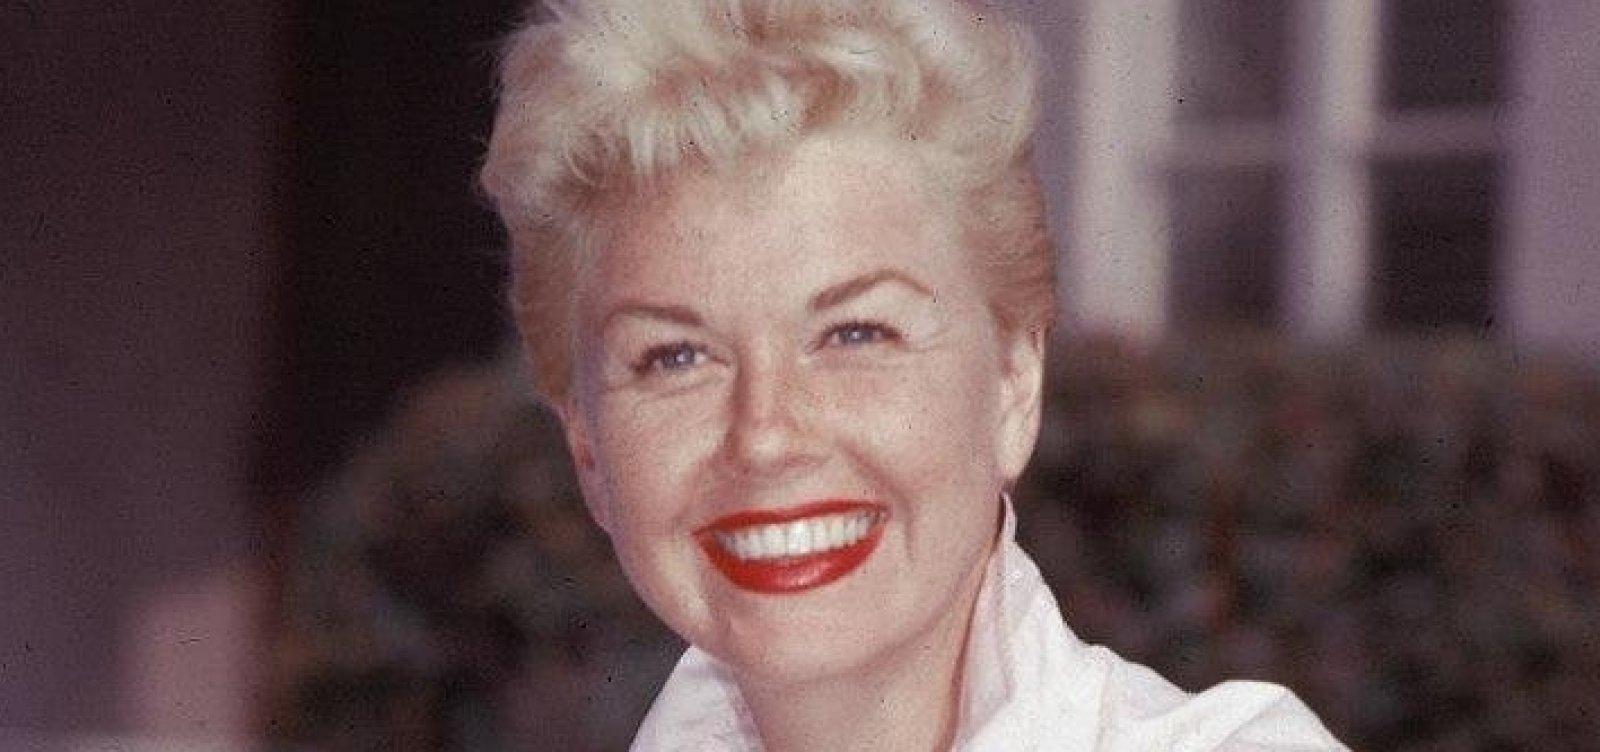 Atriz e cantora Doris Day morre aos 97 anos nos Estados Unidos